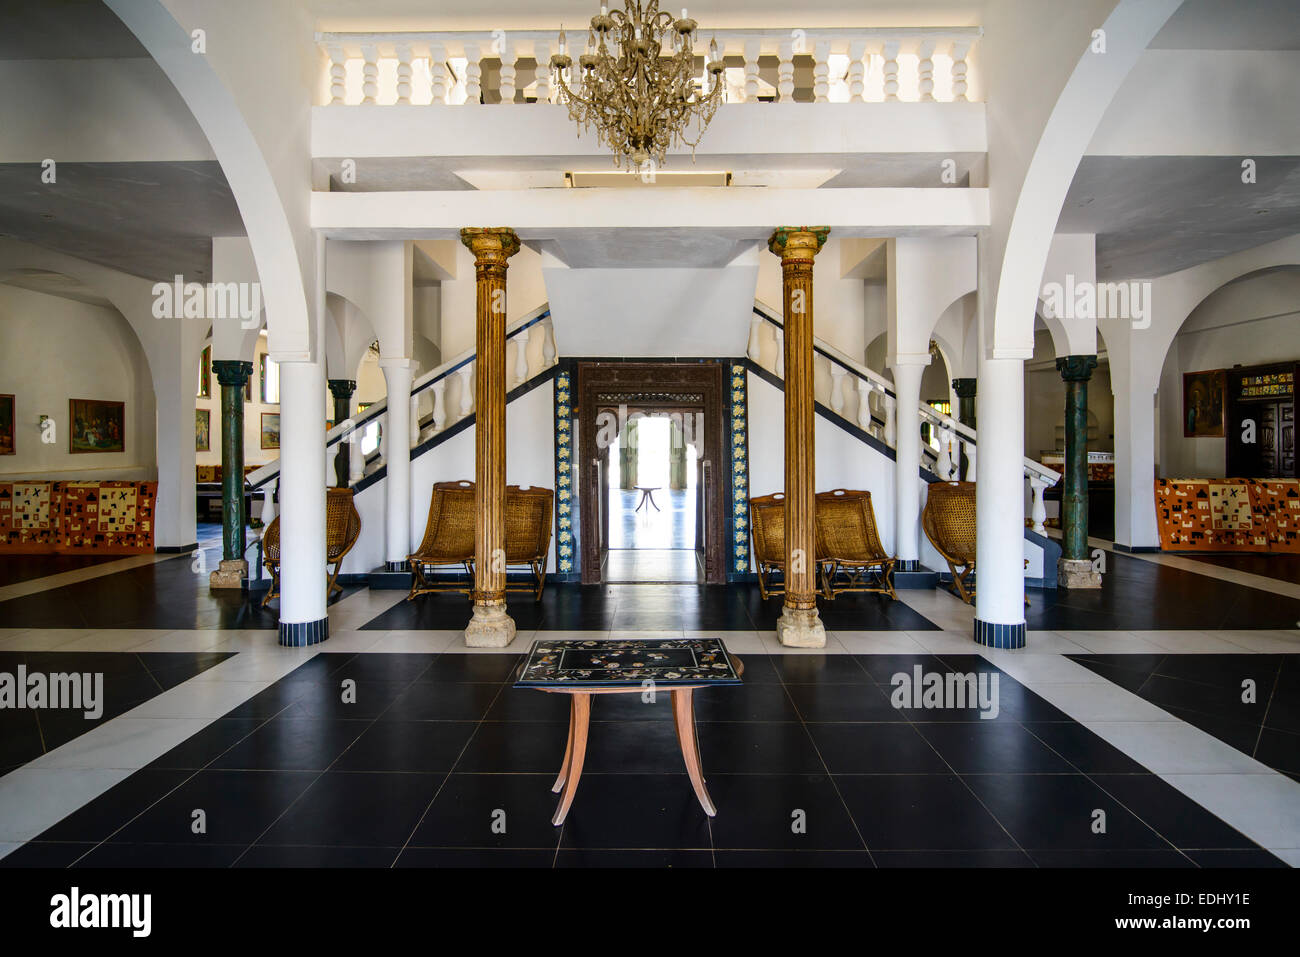 Entrance hall of a luxury hotel massawa eritrea stock for Hotel entrance decor